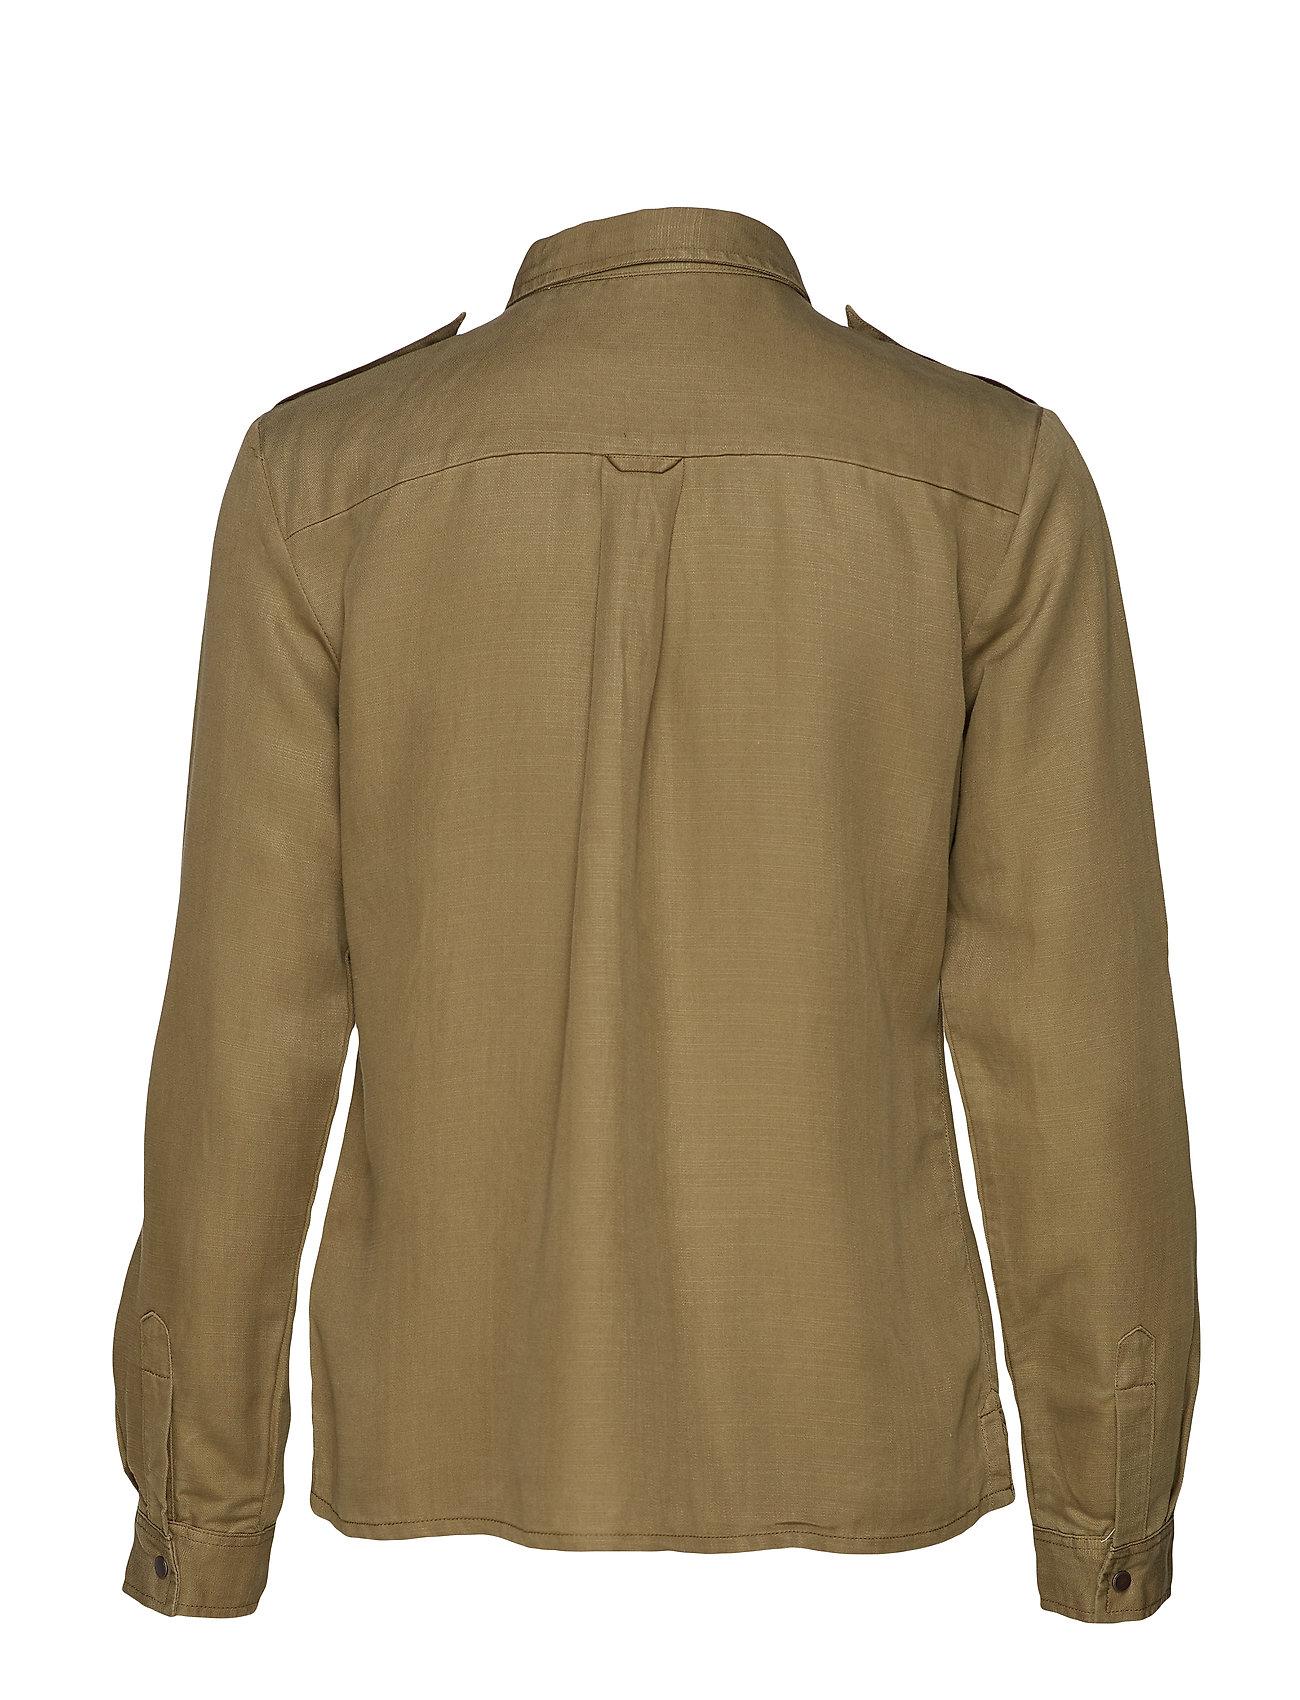 Inspired In Soda Workwear Shirt Drapy Qualitymilitary GreenScotchamp; 4A5Rj3Lq